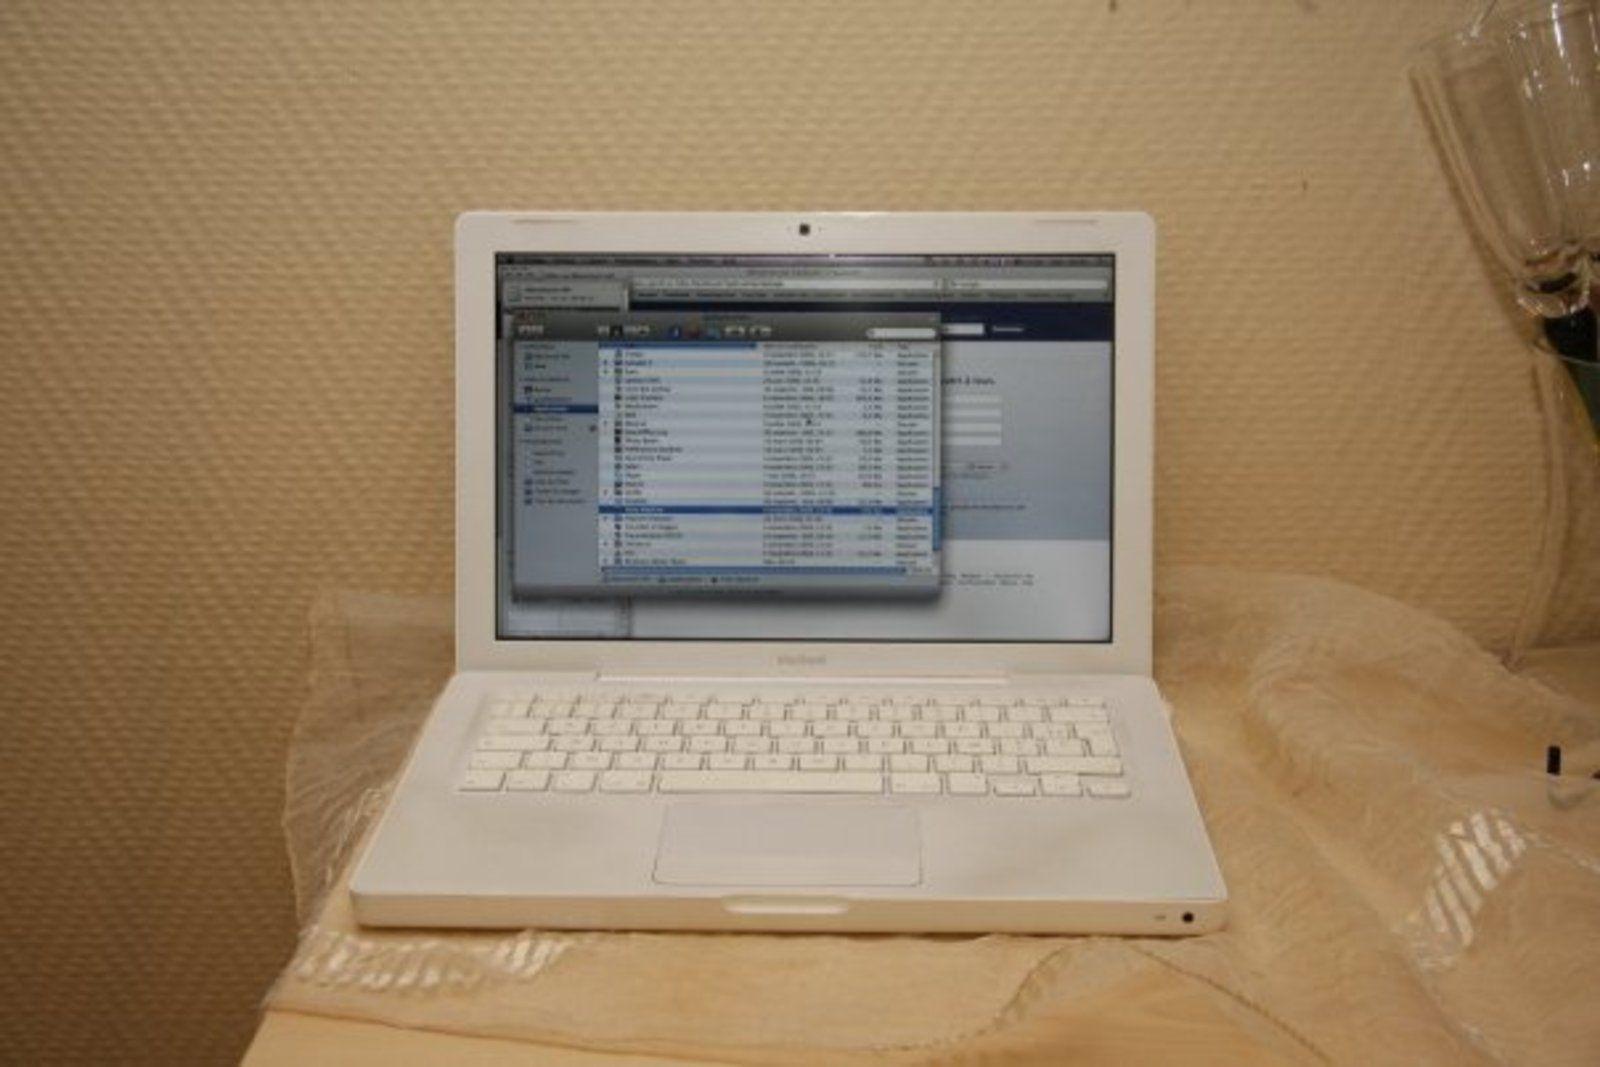 apple macbook 2 13 ghz 13 pouces image 25980. Black Bedroom Furniture Sets. Home Design Ideas